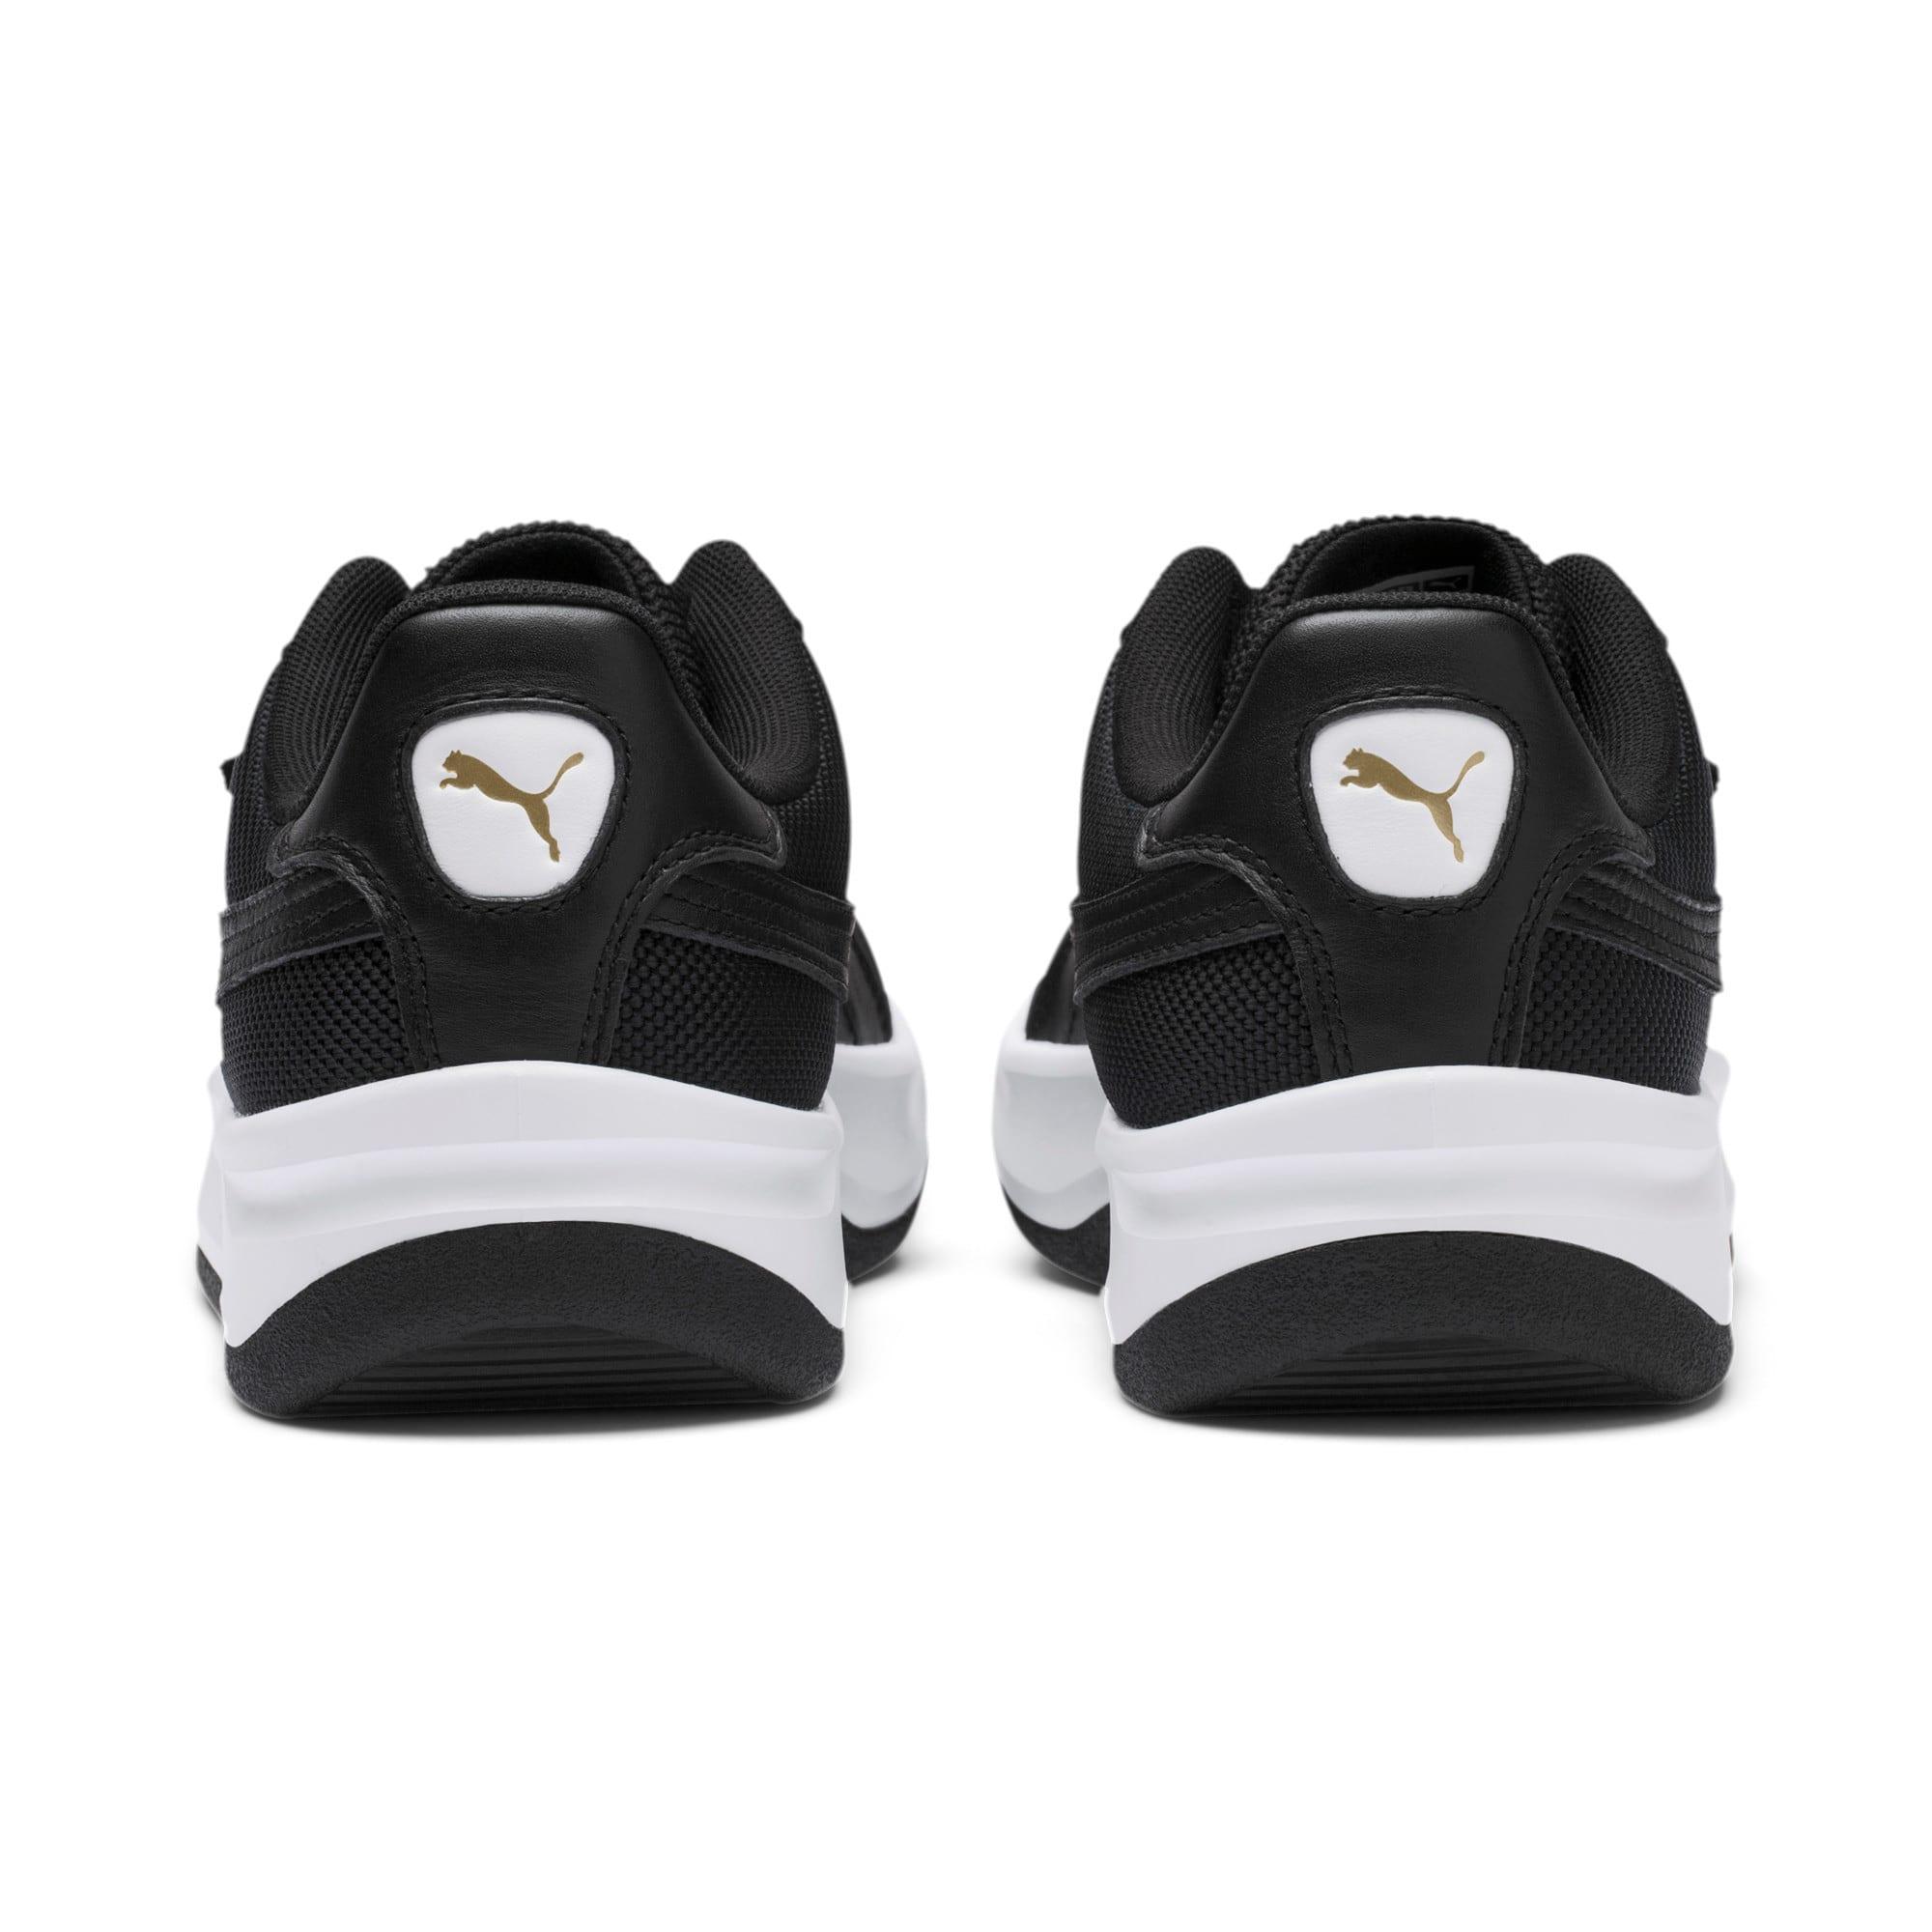 Miniatura 4 de Zapatos deportivos California, P Black-P White-P Black, mediano